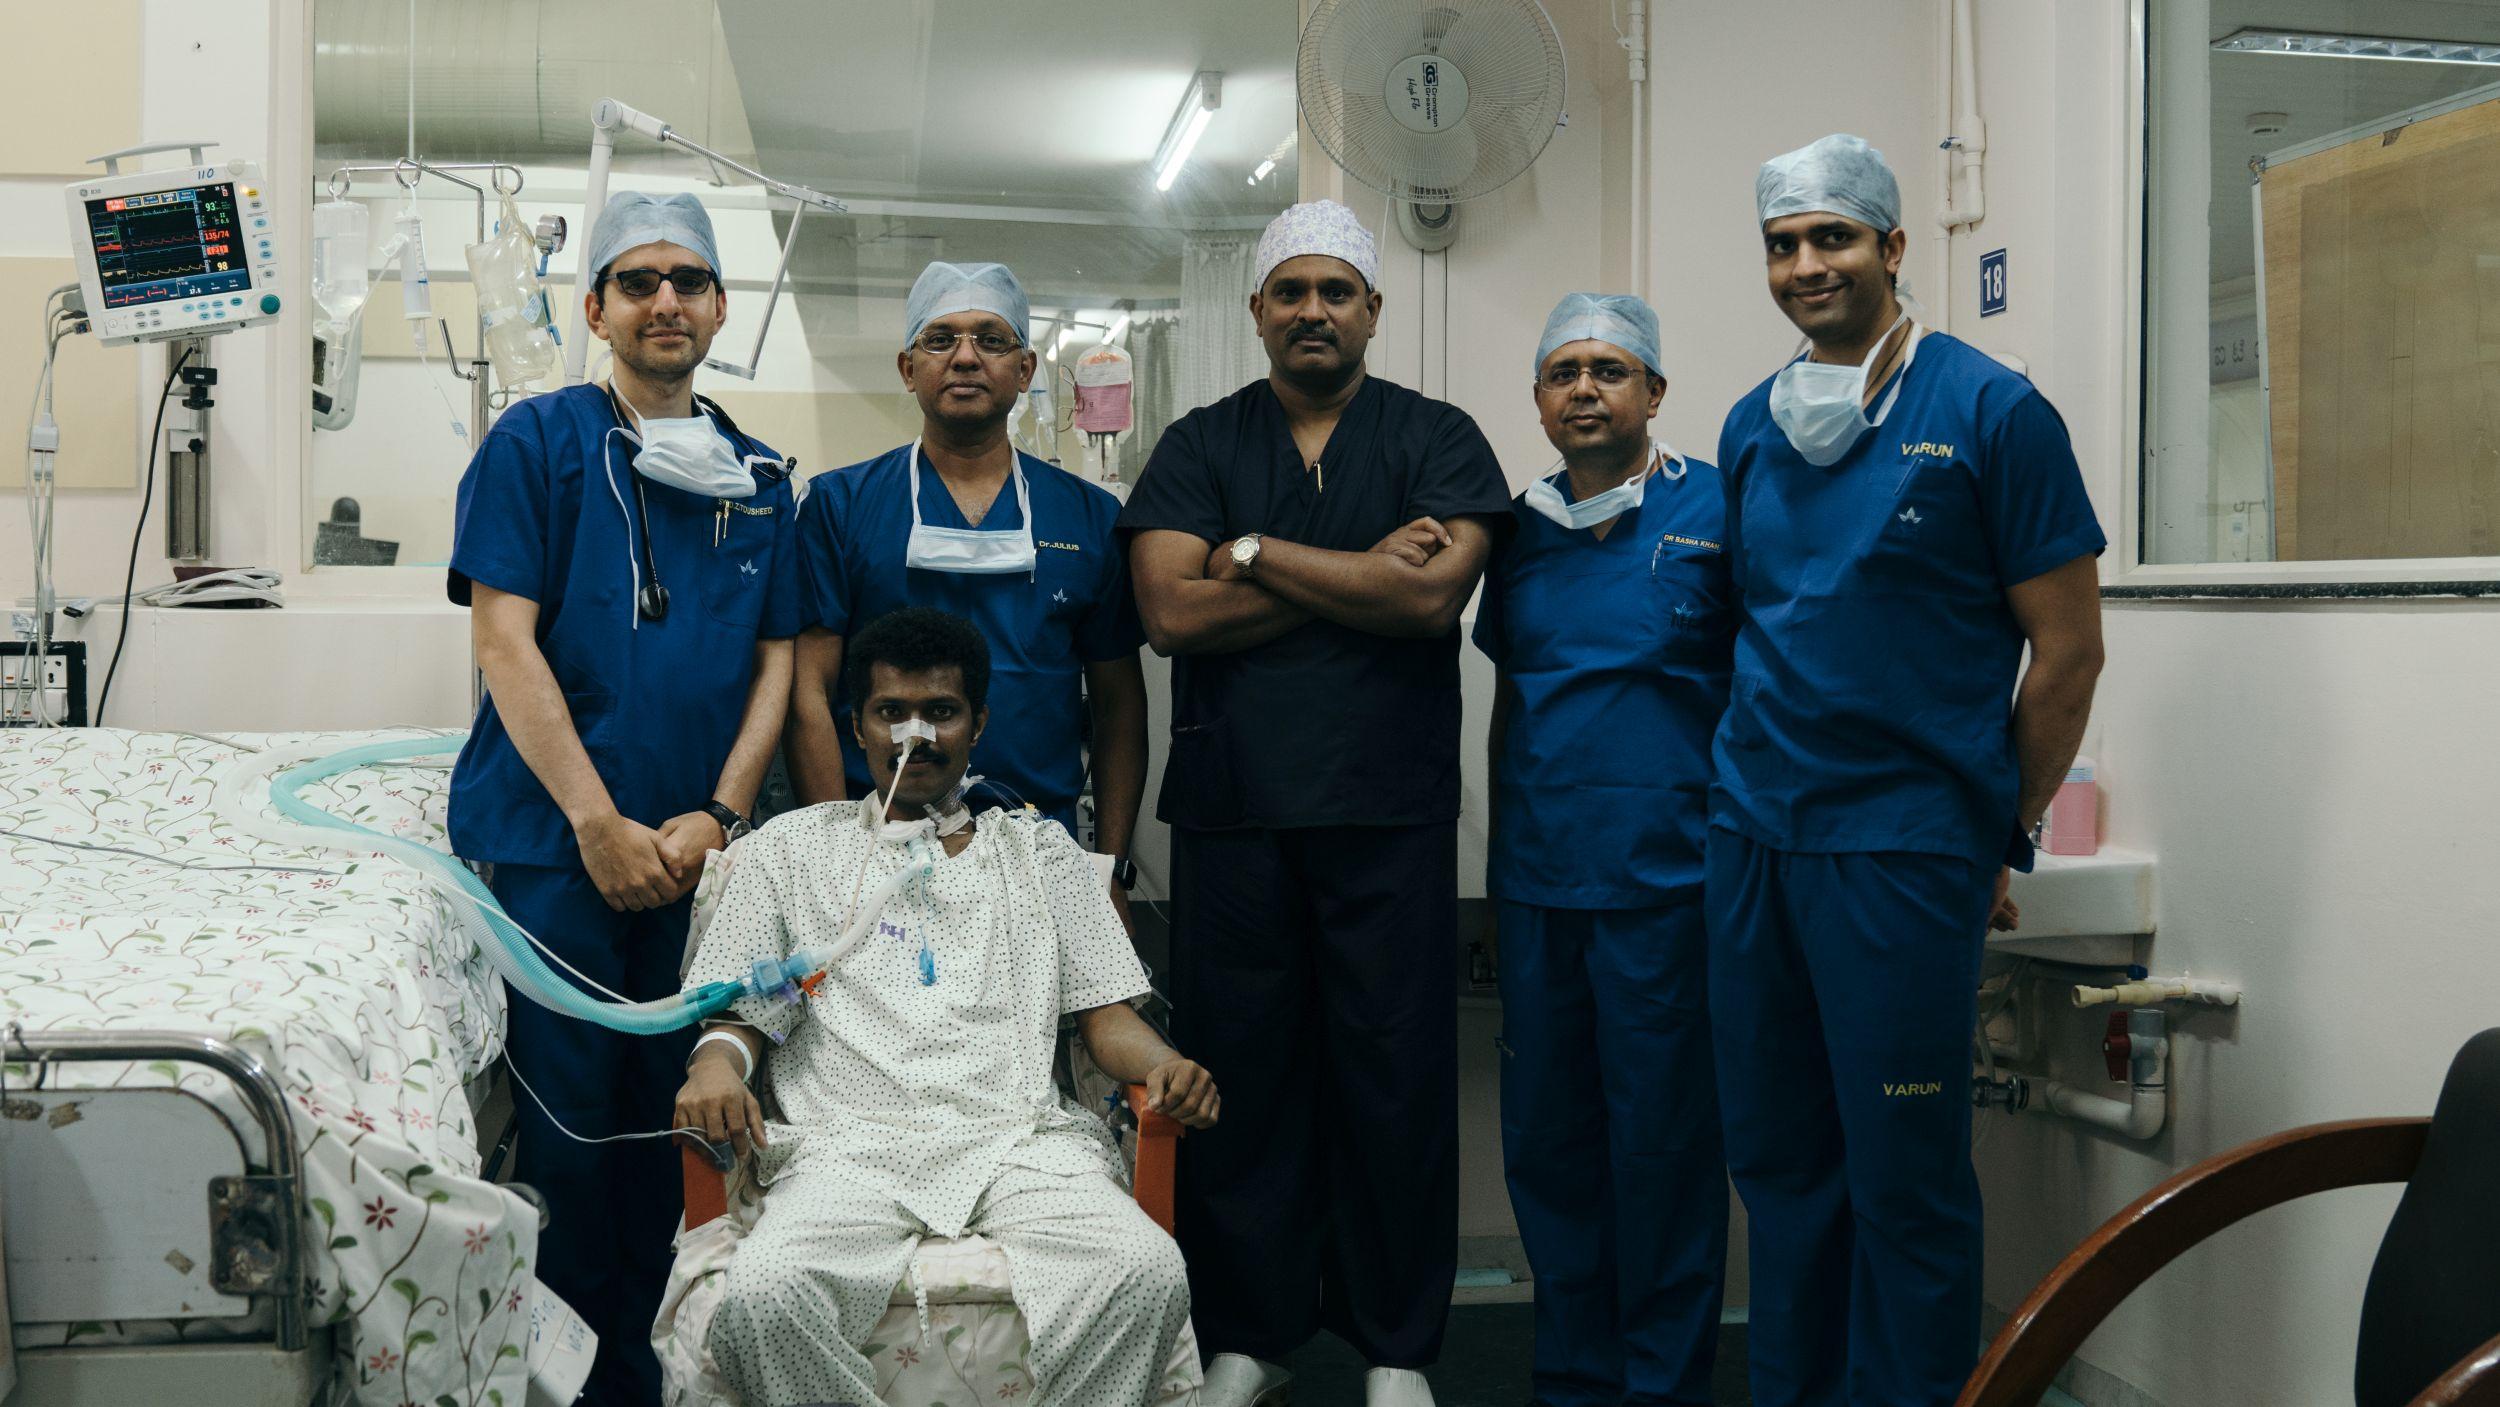 NARAYANA HEALTH CITY PERFORMS KARNATAKA'S FIRST DOUBLE LUNG TRANSPLANT